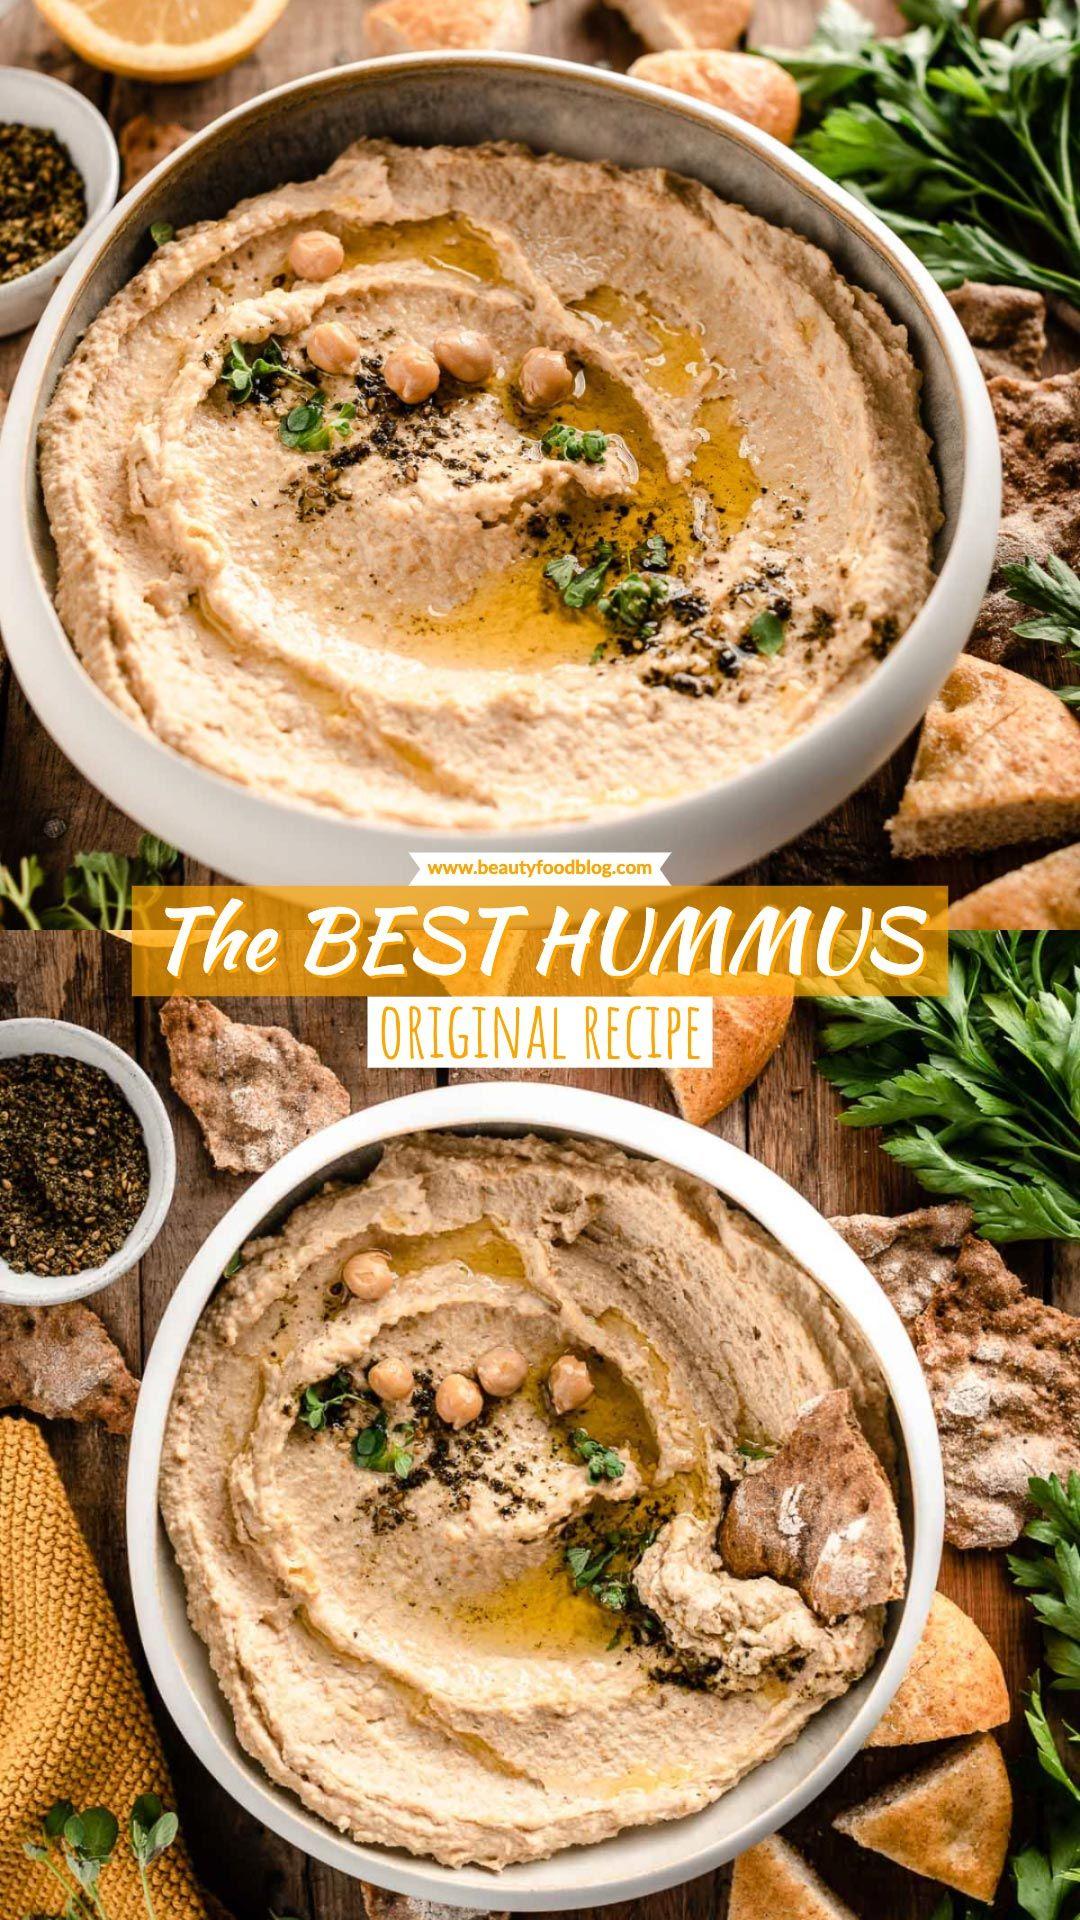 05f53780a82ae9f6503198f9bdb0f220 - Ricette Hummus